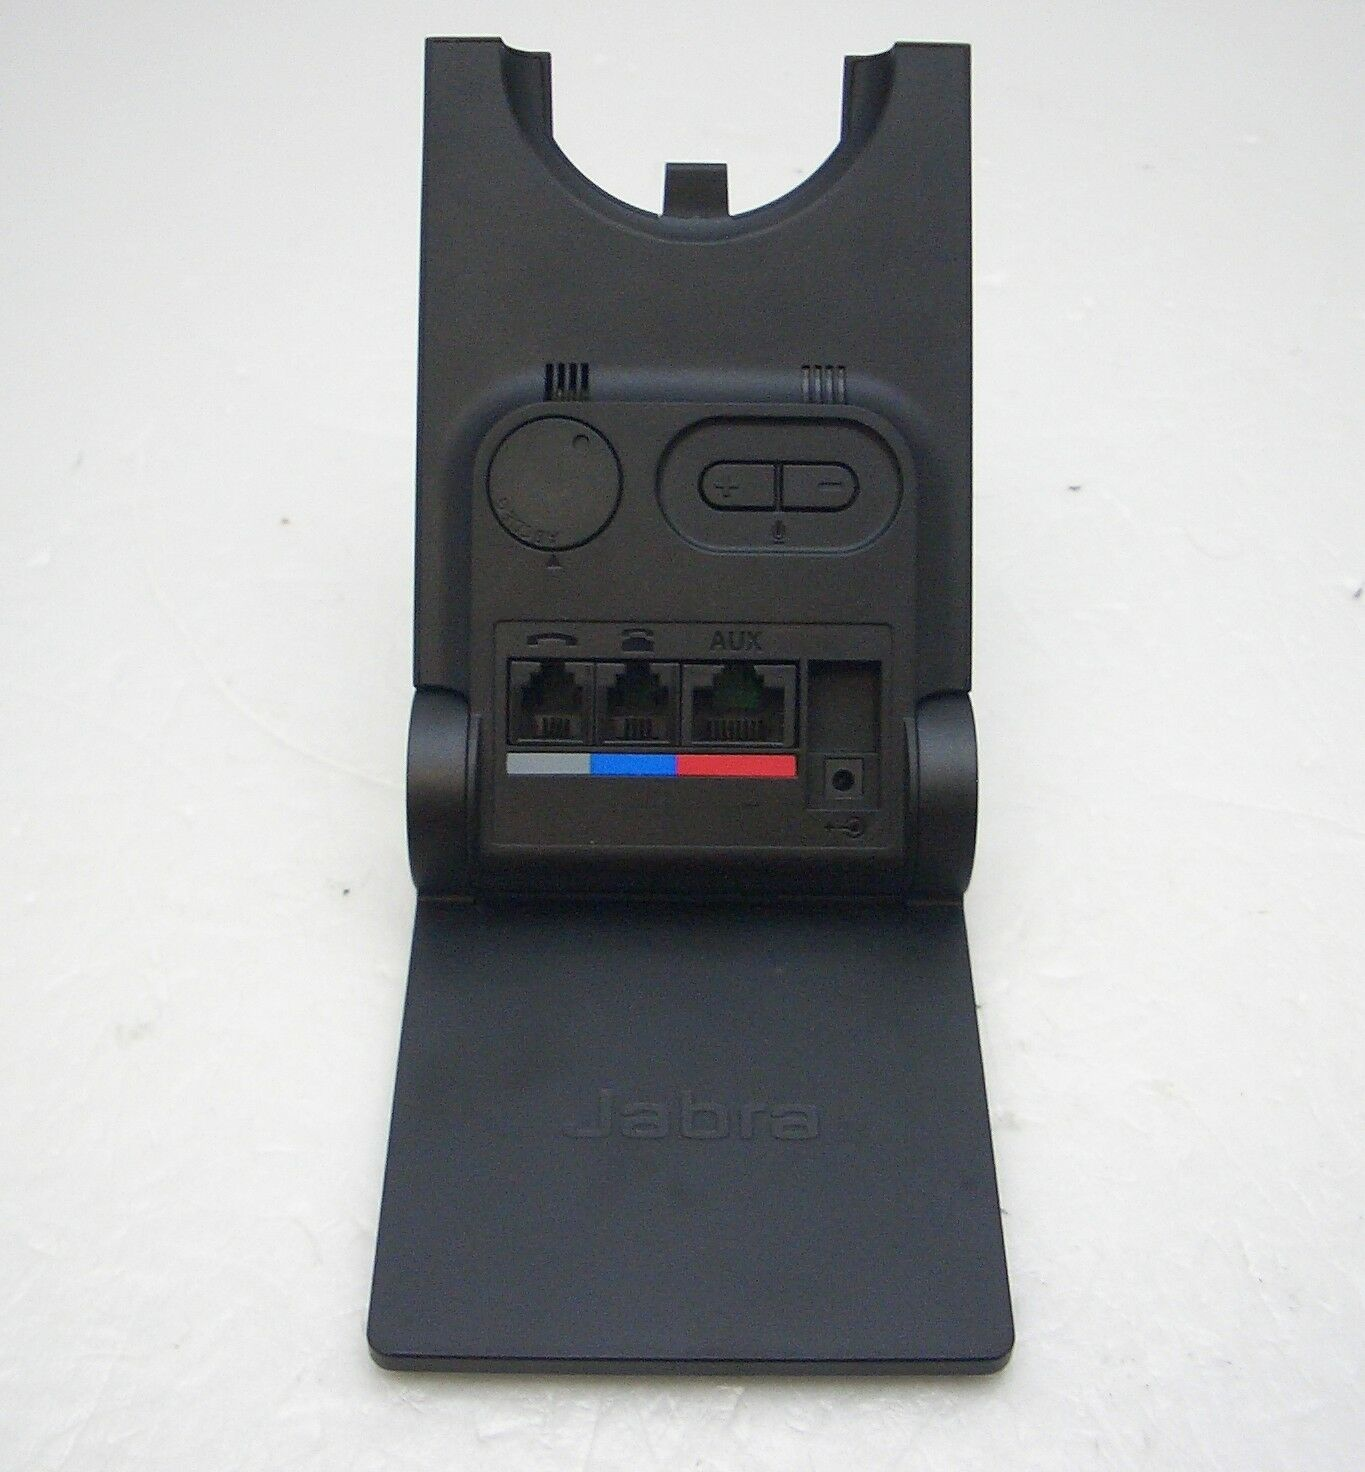 Jabra Pro 920 Ehs Wireless Bundle For Yealink Phones: Jabra PRO 920 WHB003BS Mono Wireless Headset Spare Base